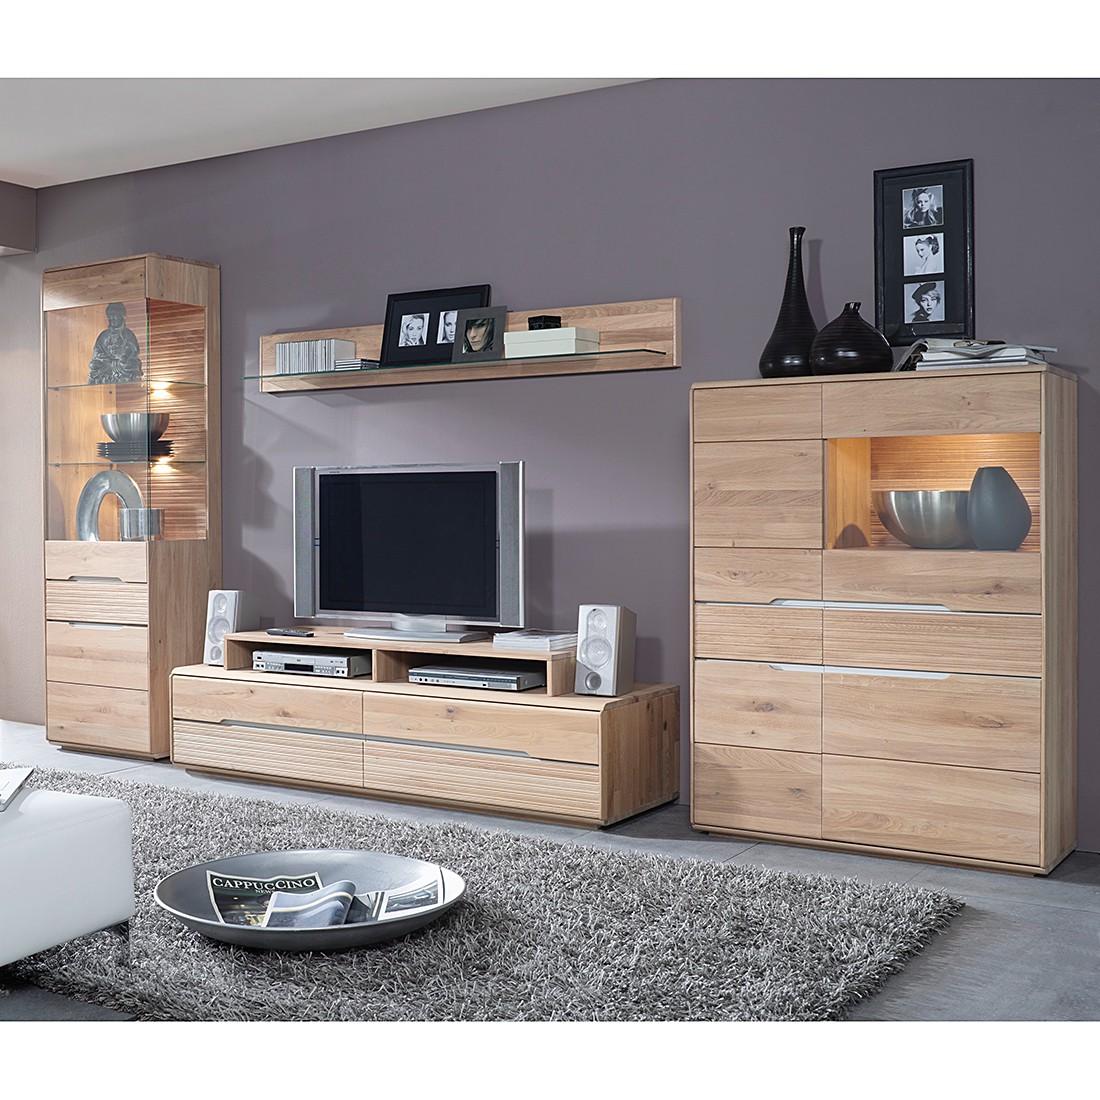 fabulous wohnwand massivholz gnstig with wohnwand massivholz gnstig